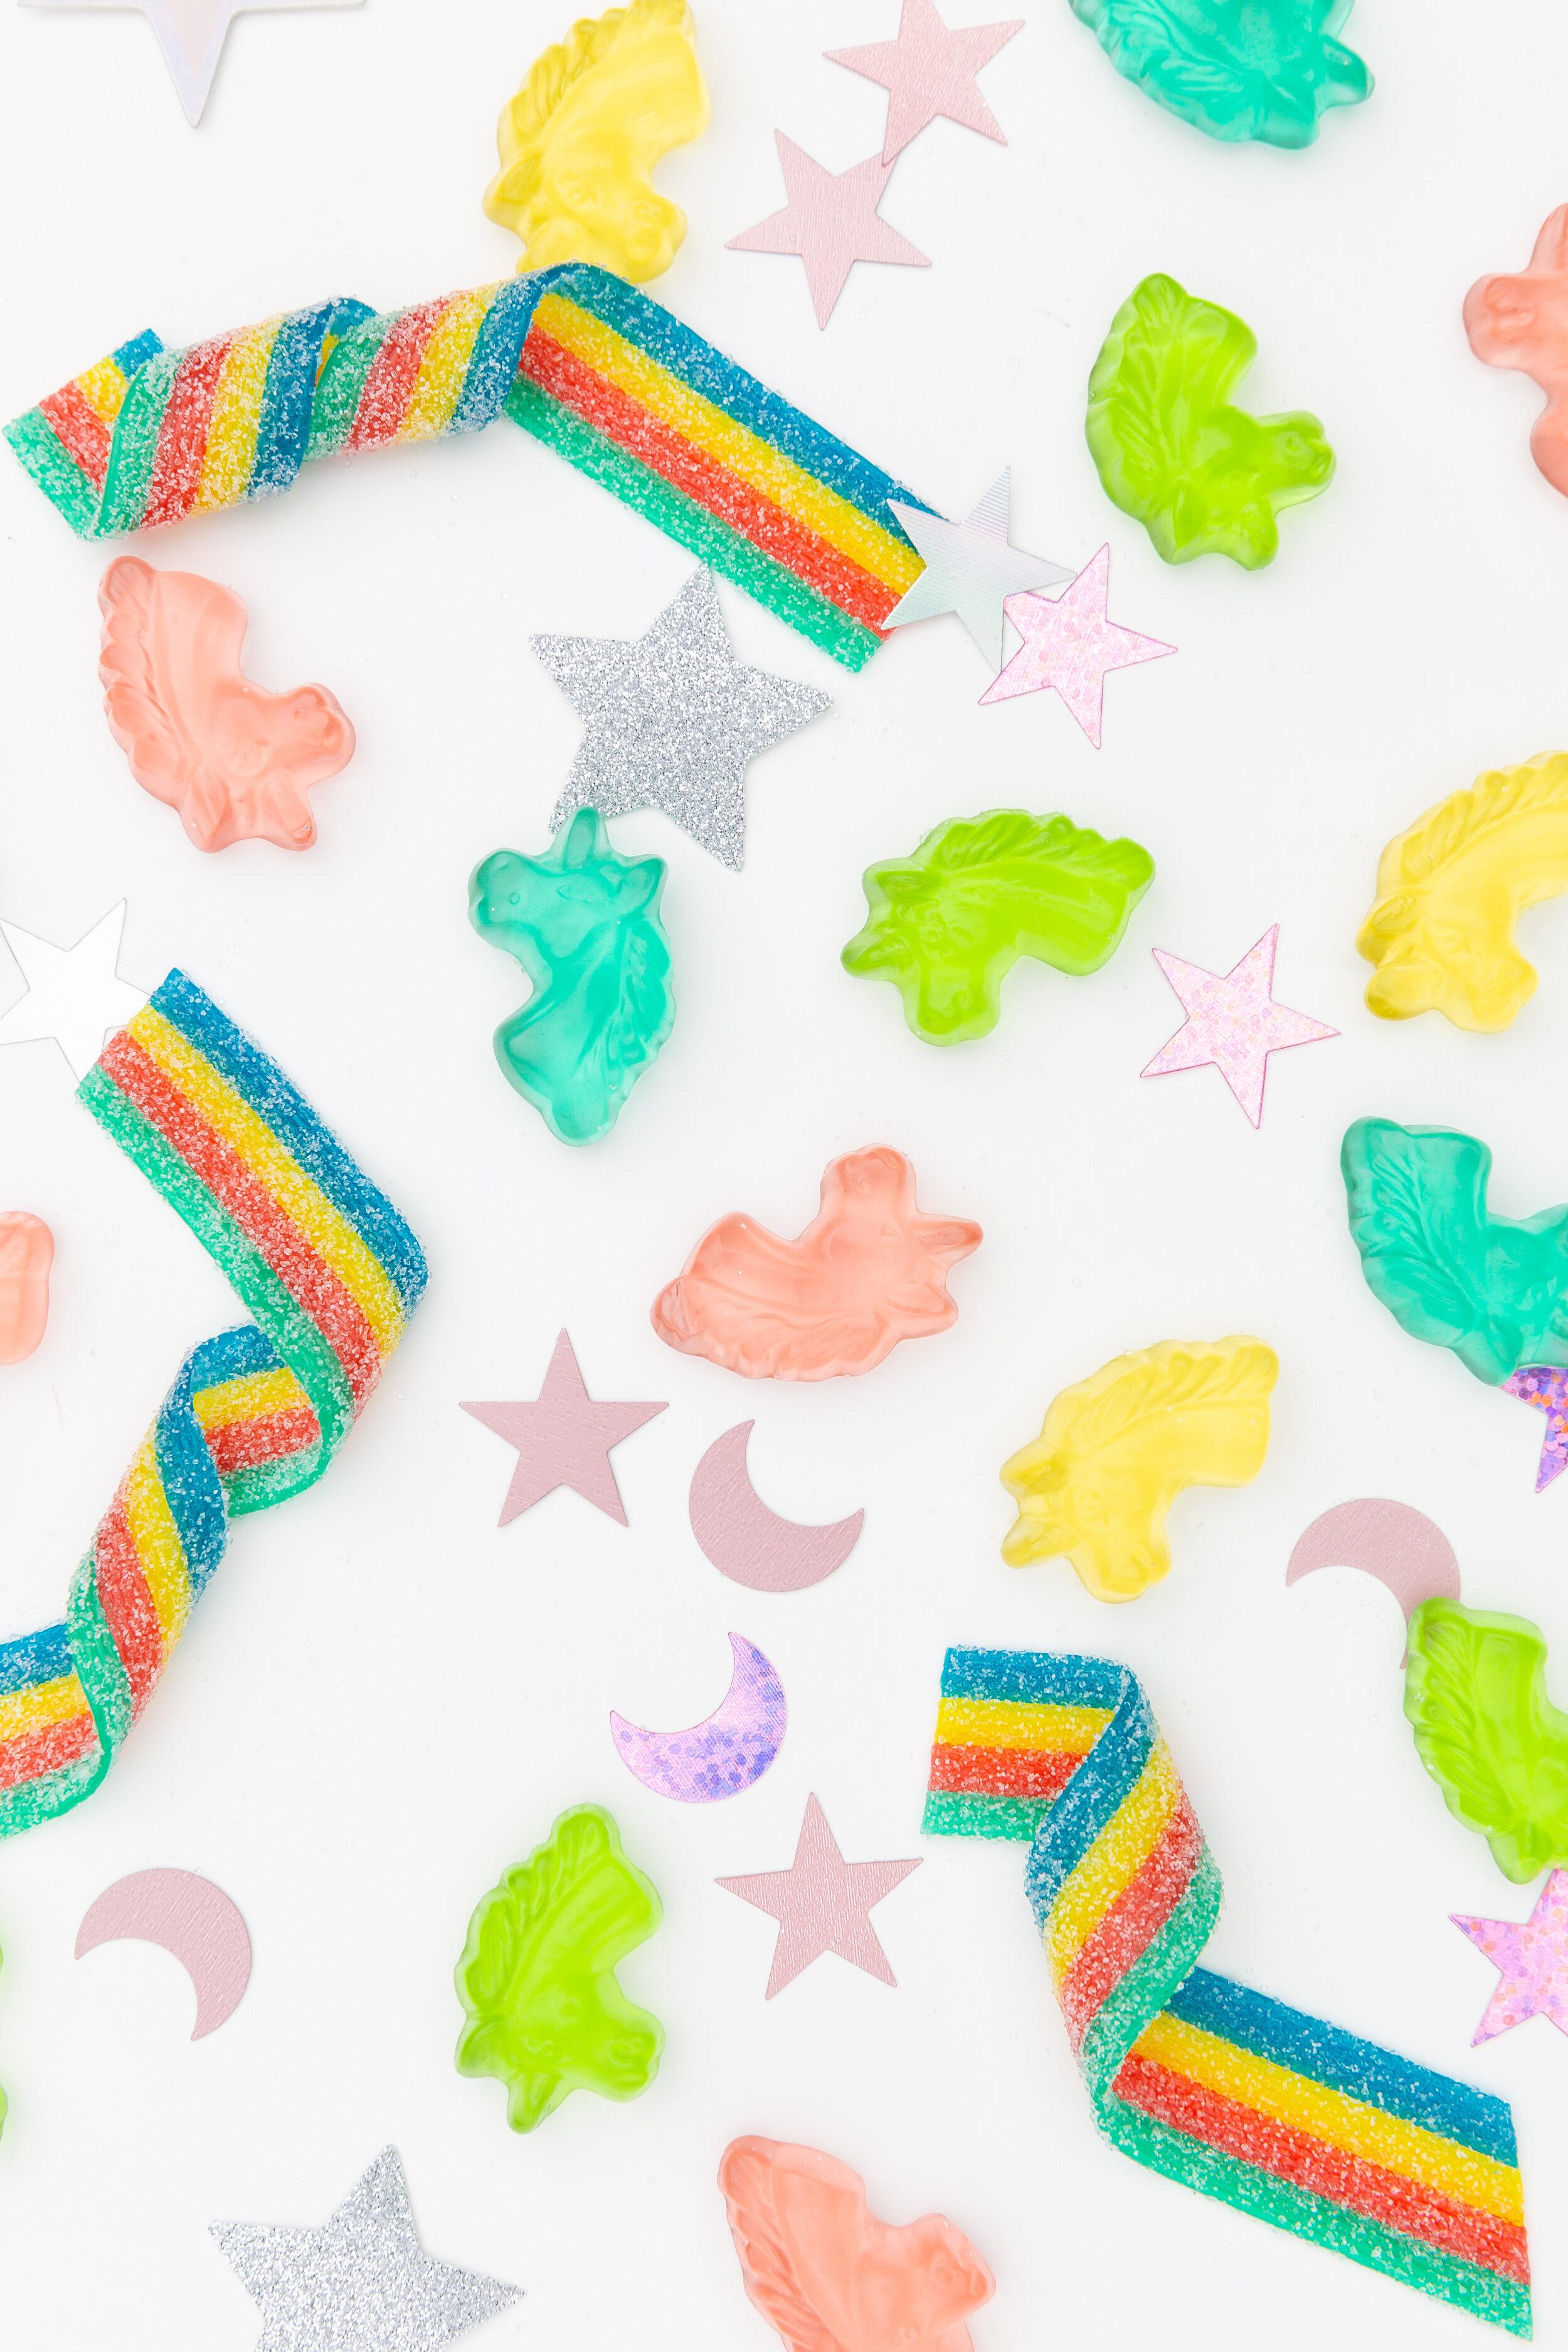 2018-08-28 - Squish Candy-108.jpg